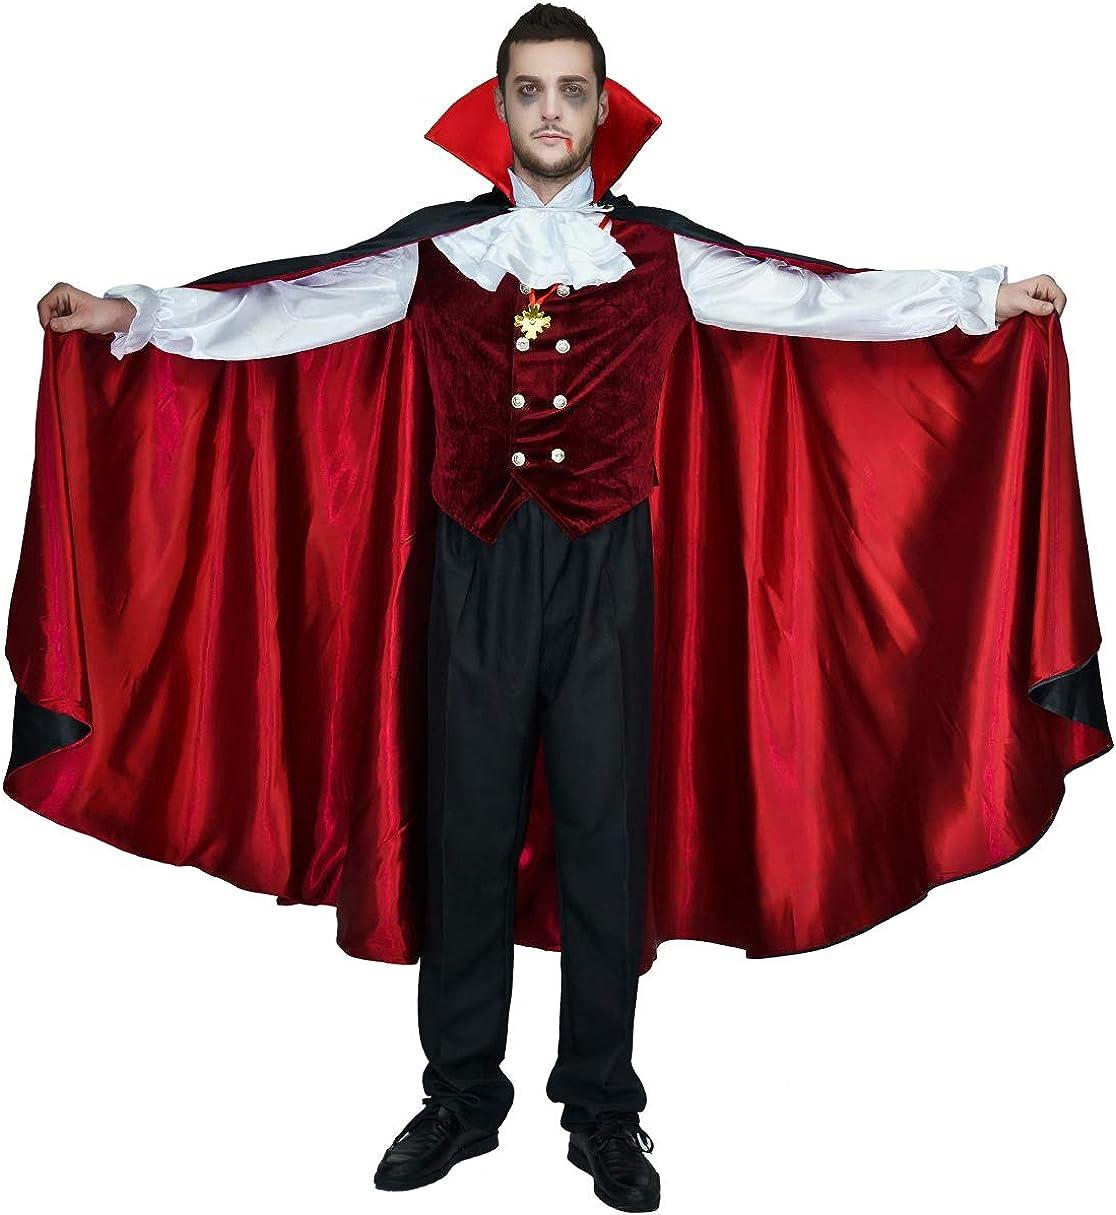 Mens Count Bloodthirst Costume Vampire Adult Dracula Halloween Fancy Dress